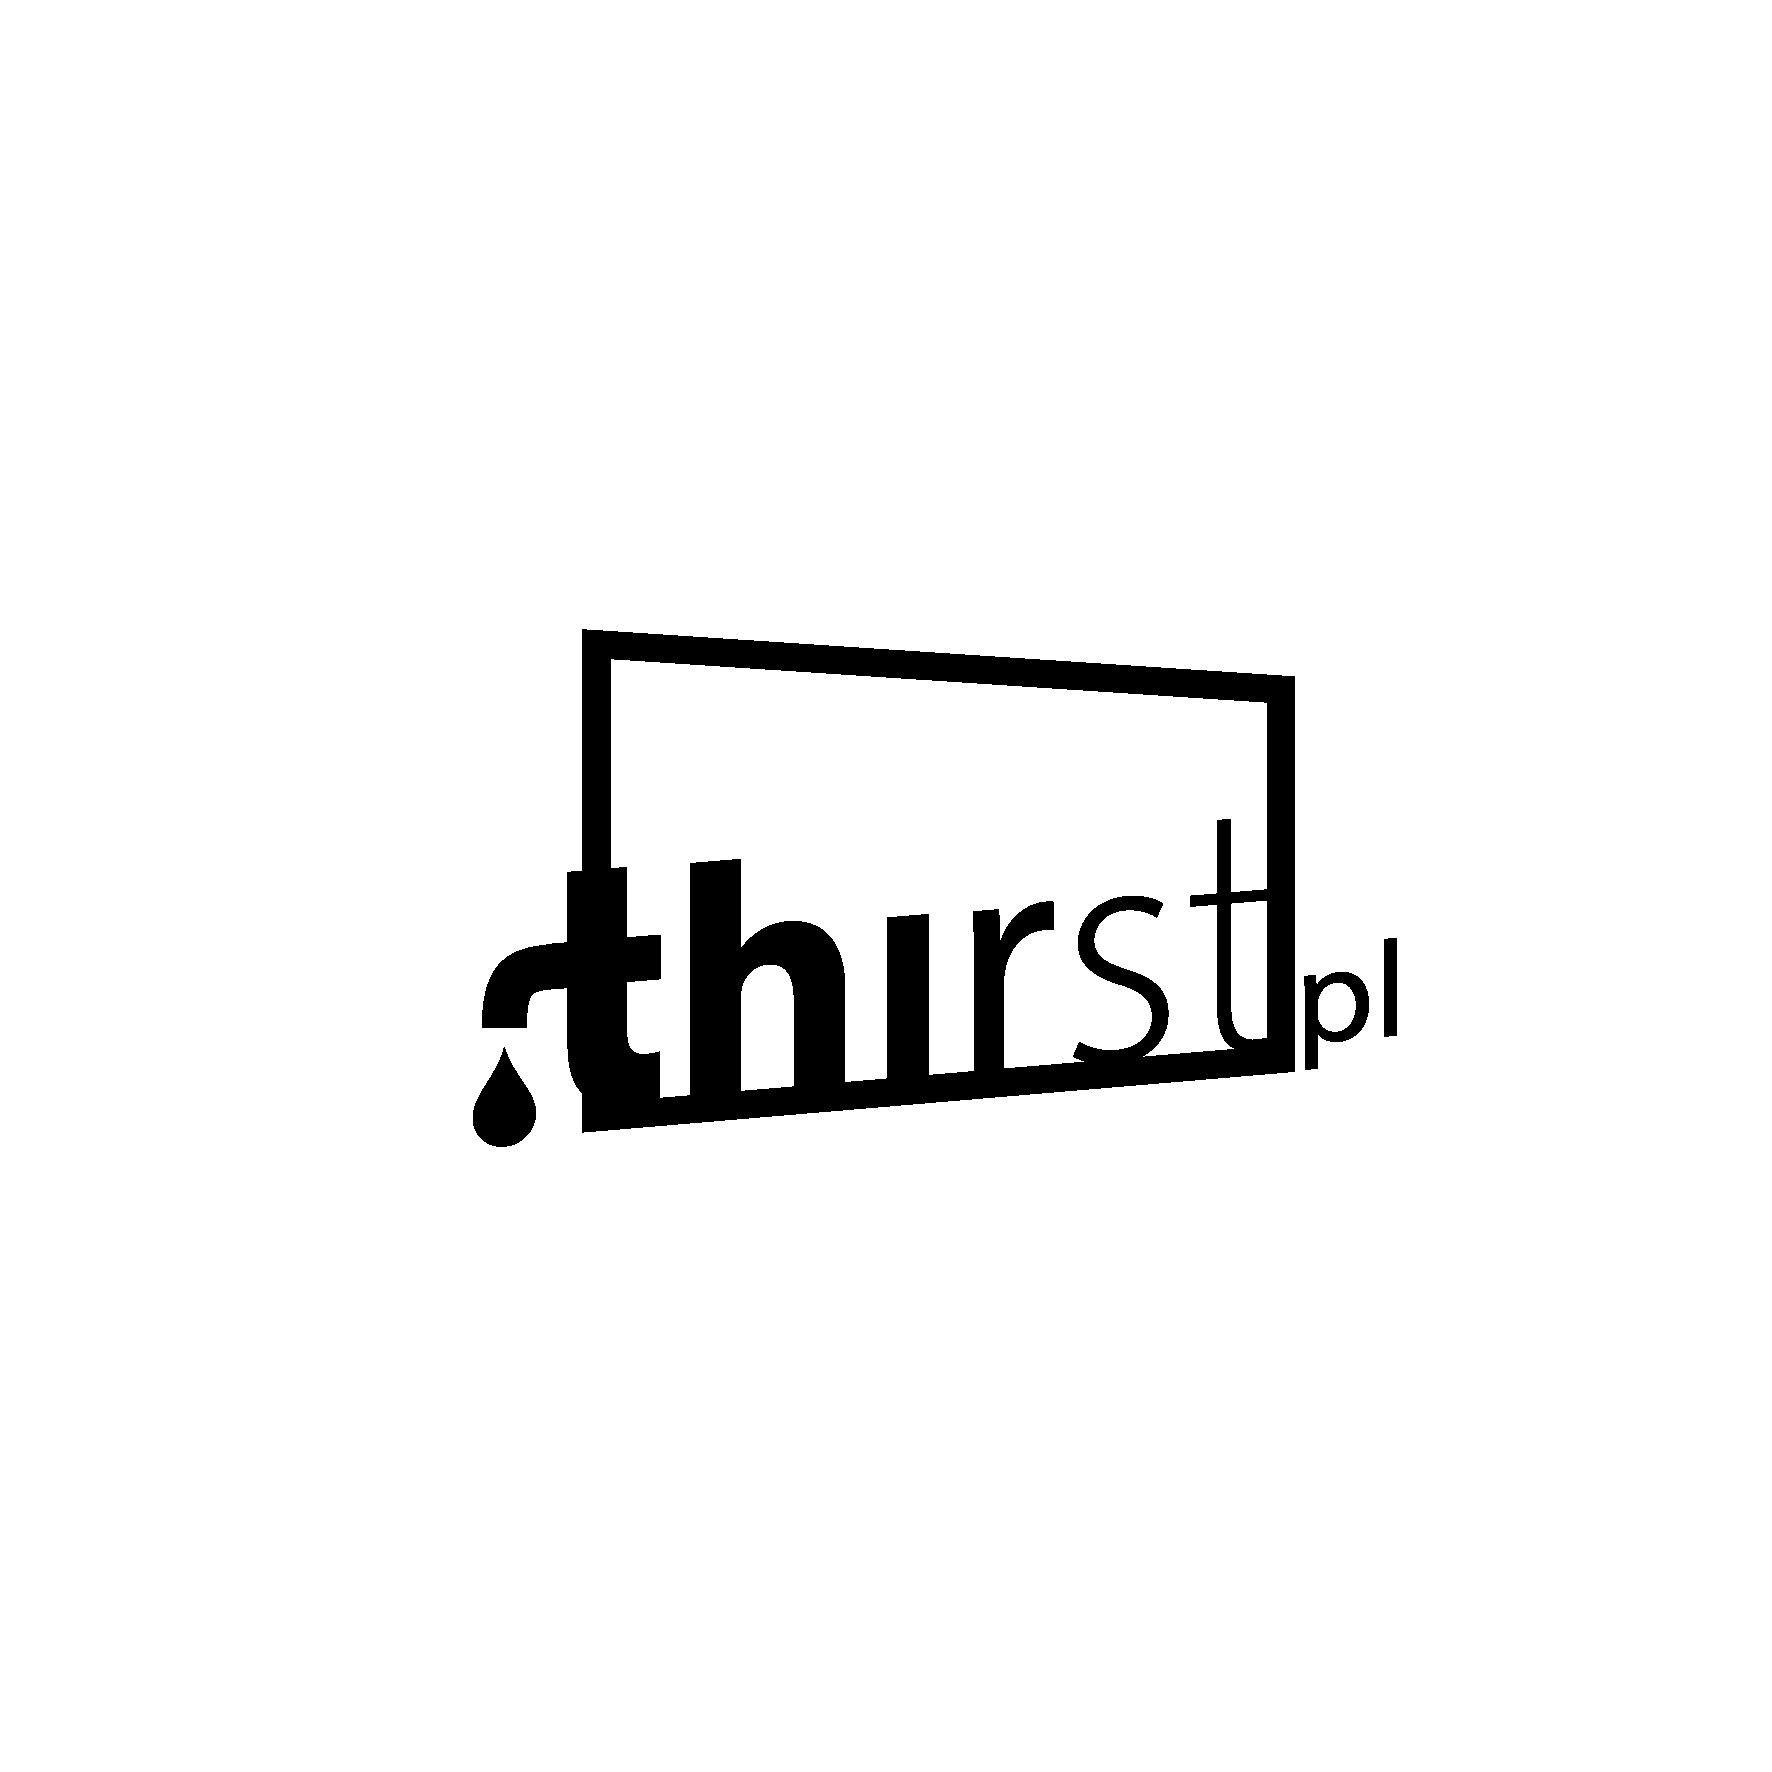 thirst.pl